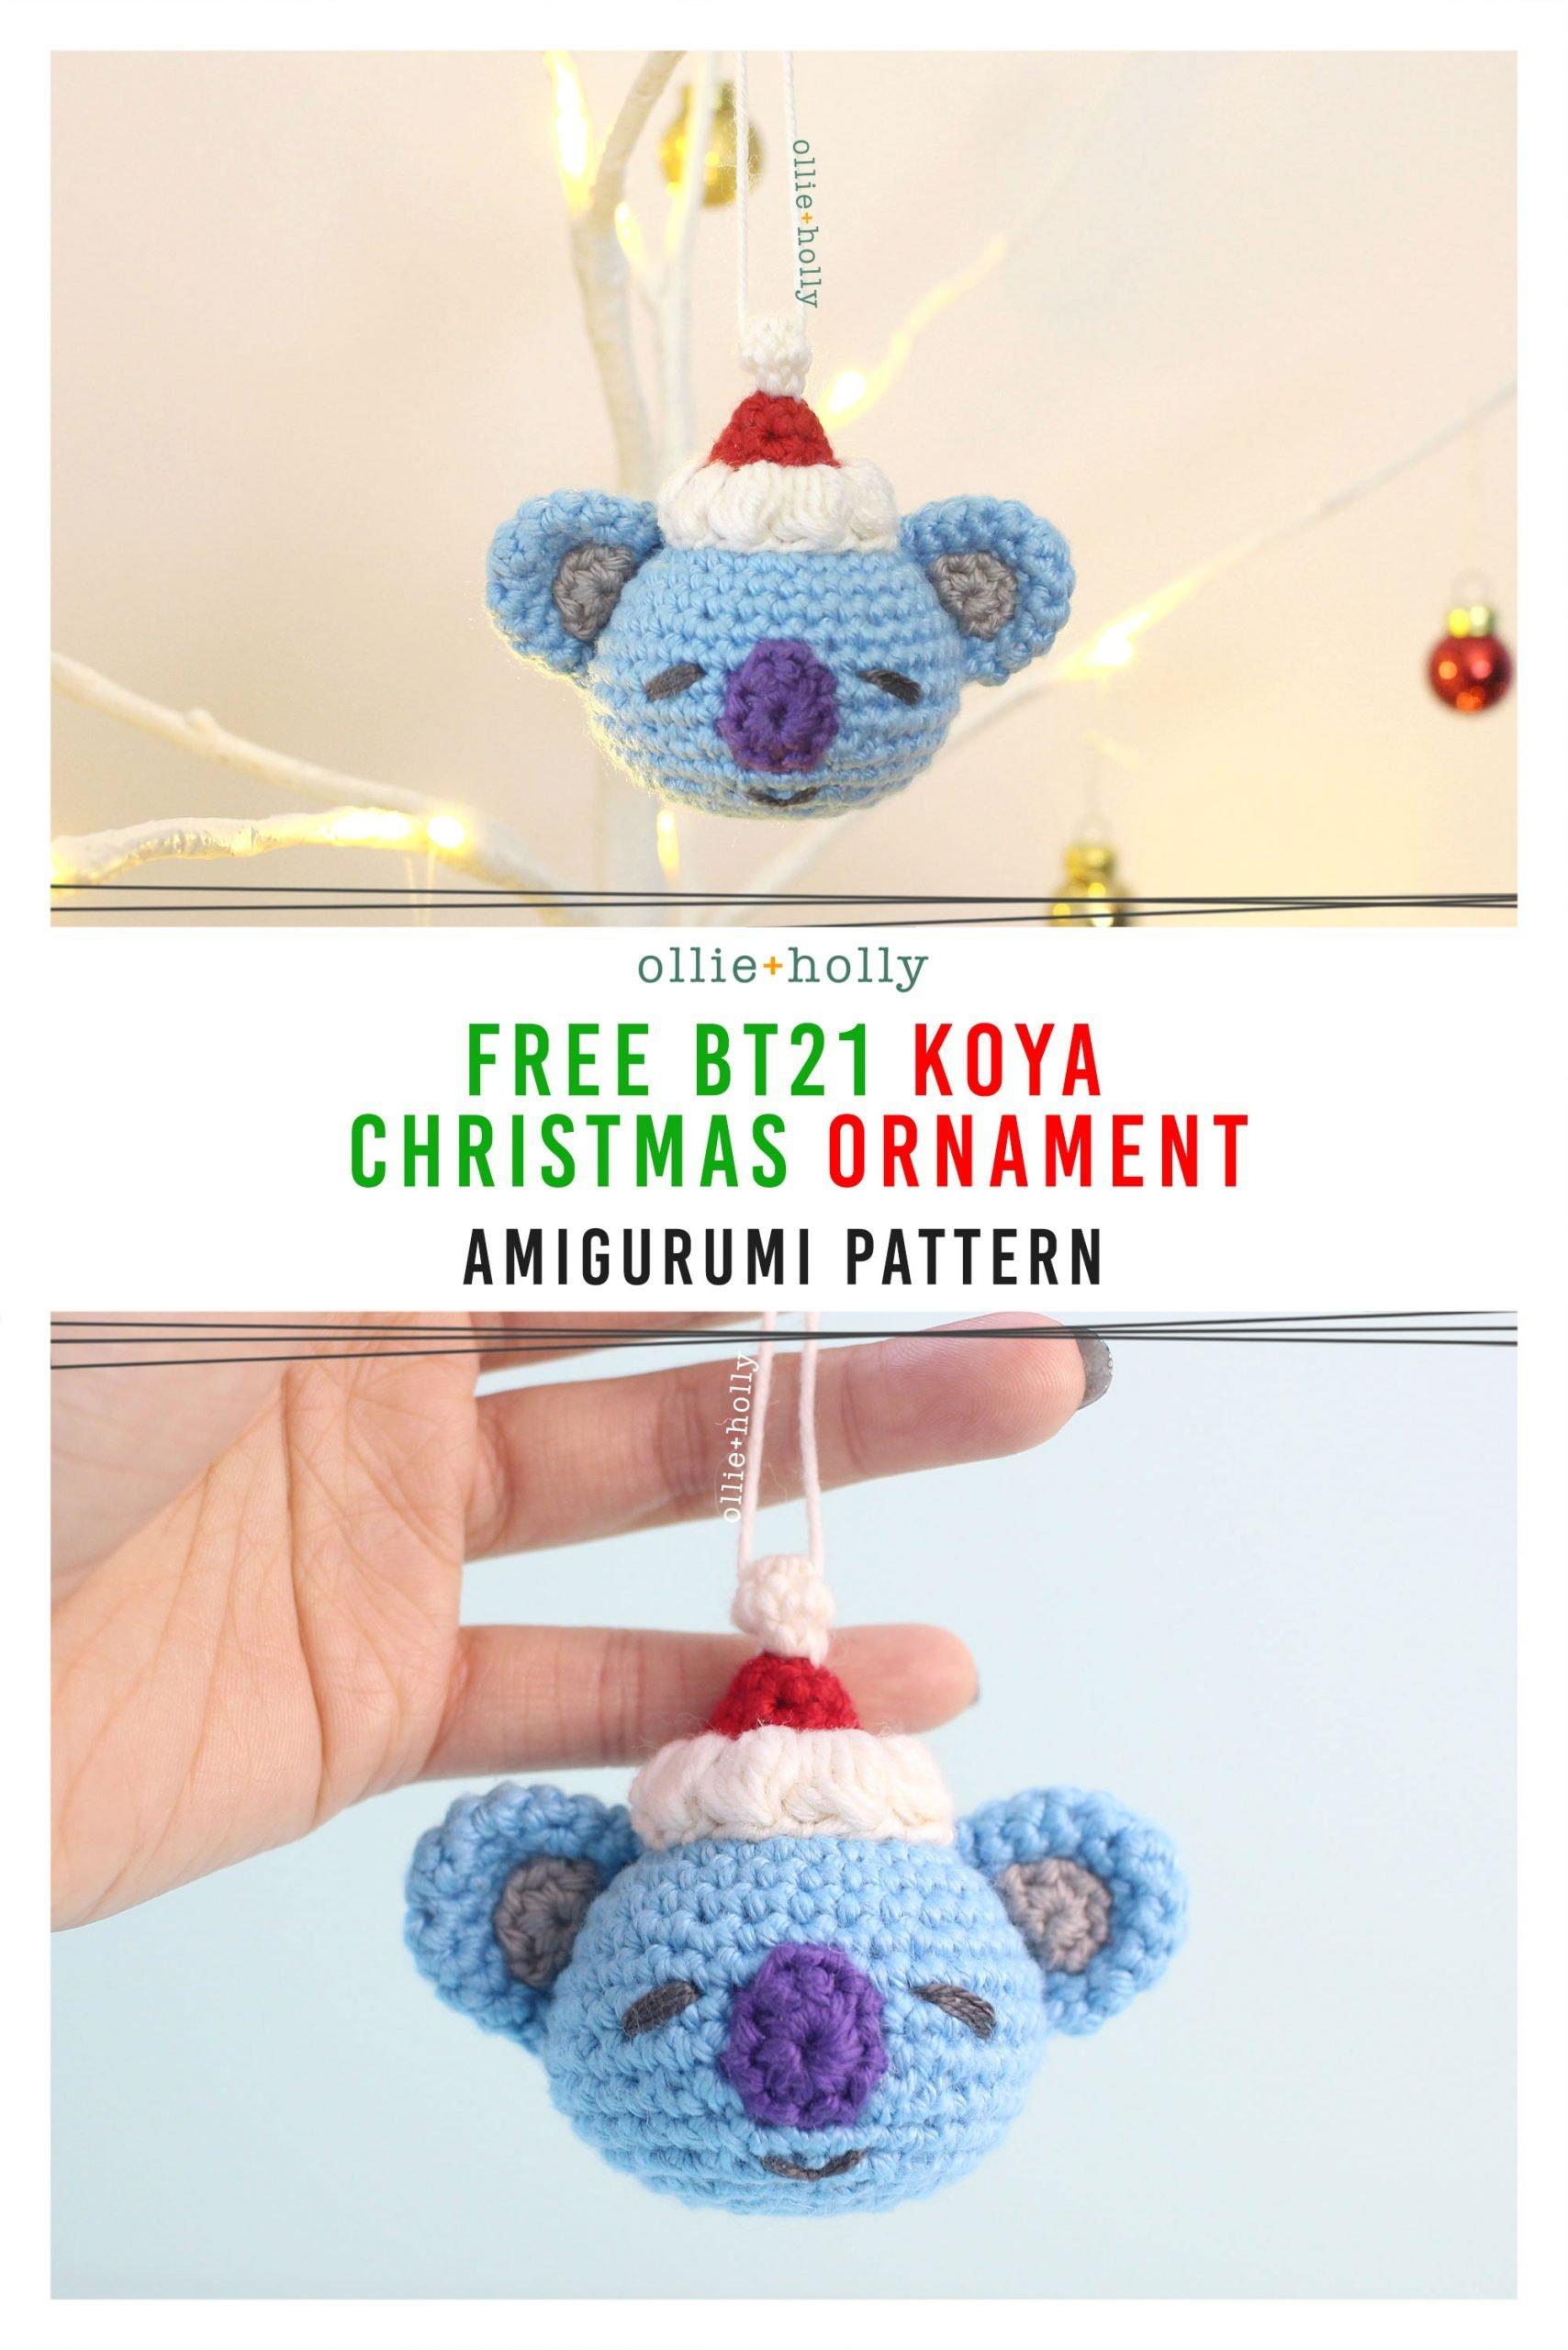 Free BT21 Koya Christmas Ornament Amigurumi Crochet Pattern